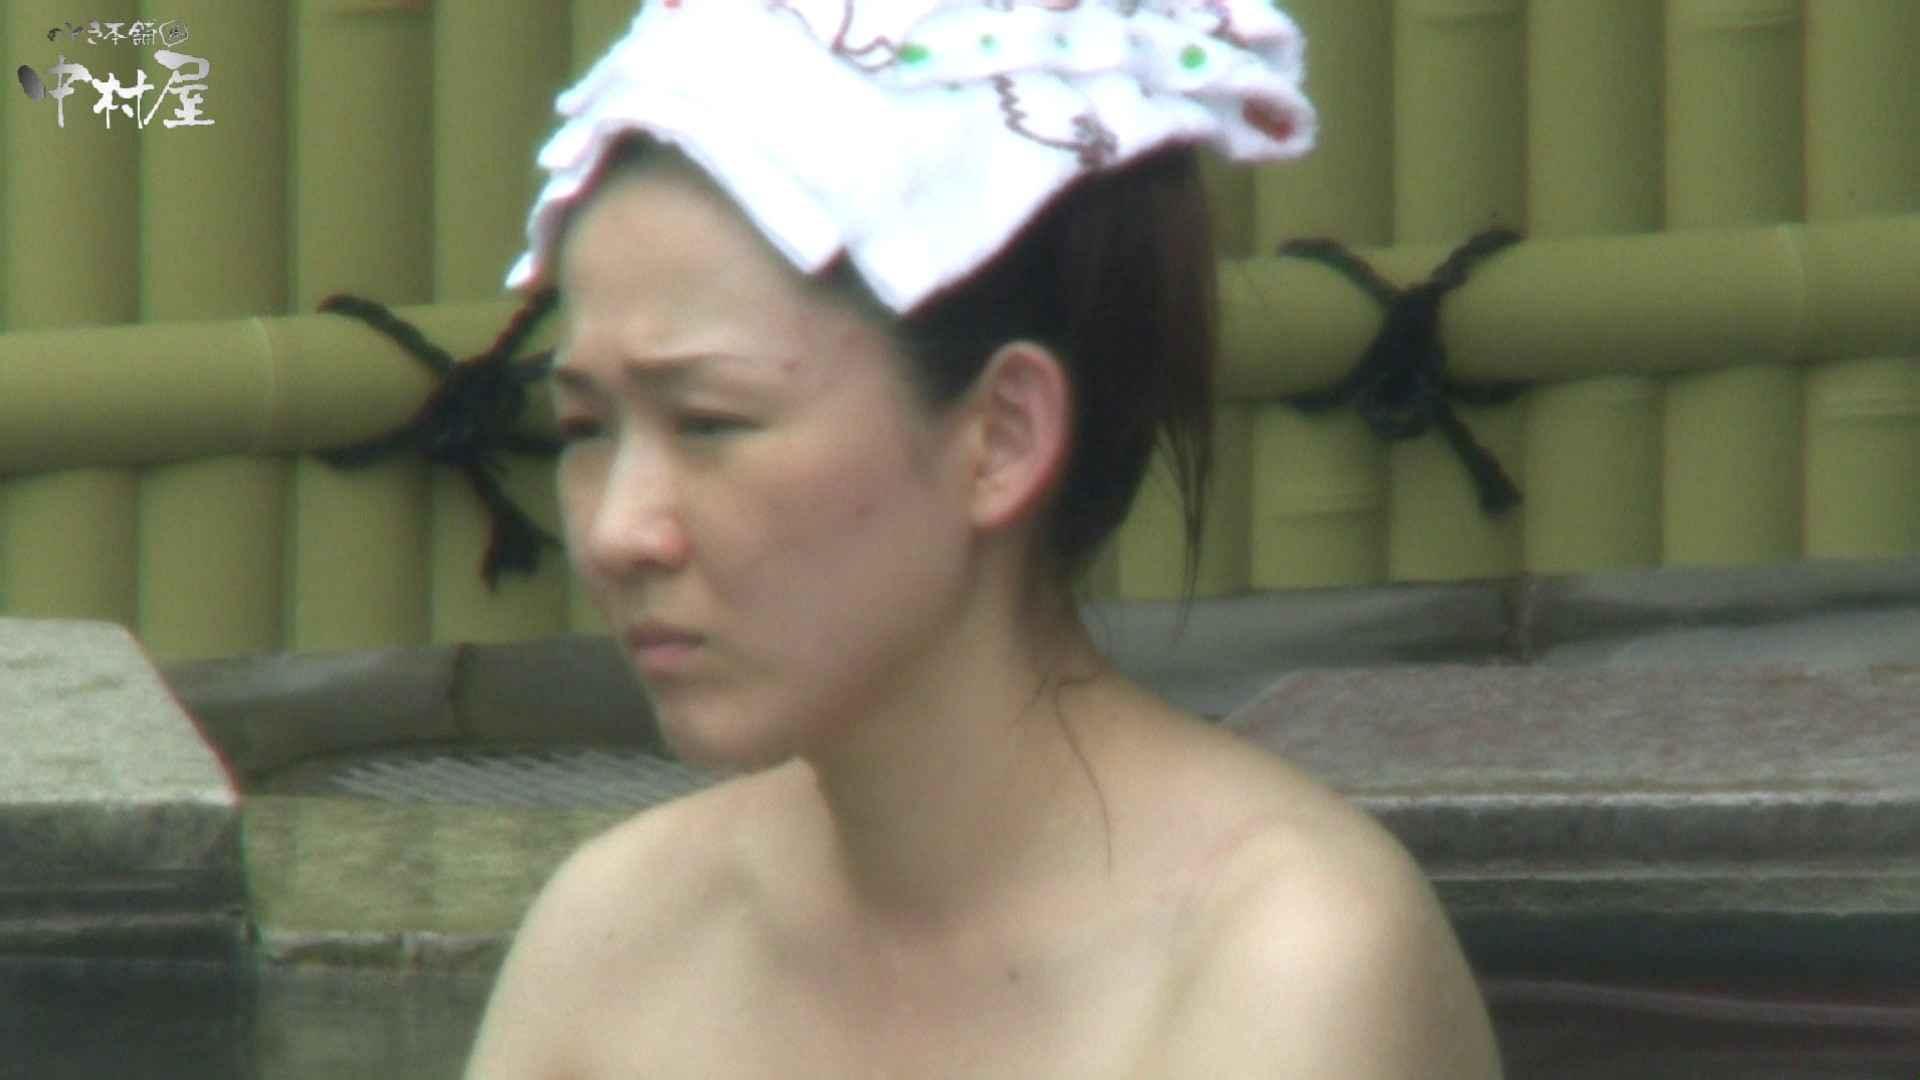 Aquaな露天風呂Vol.943 露天 | OLセックス  108画像 34